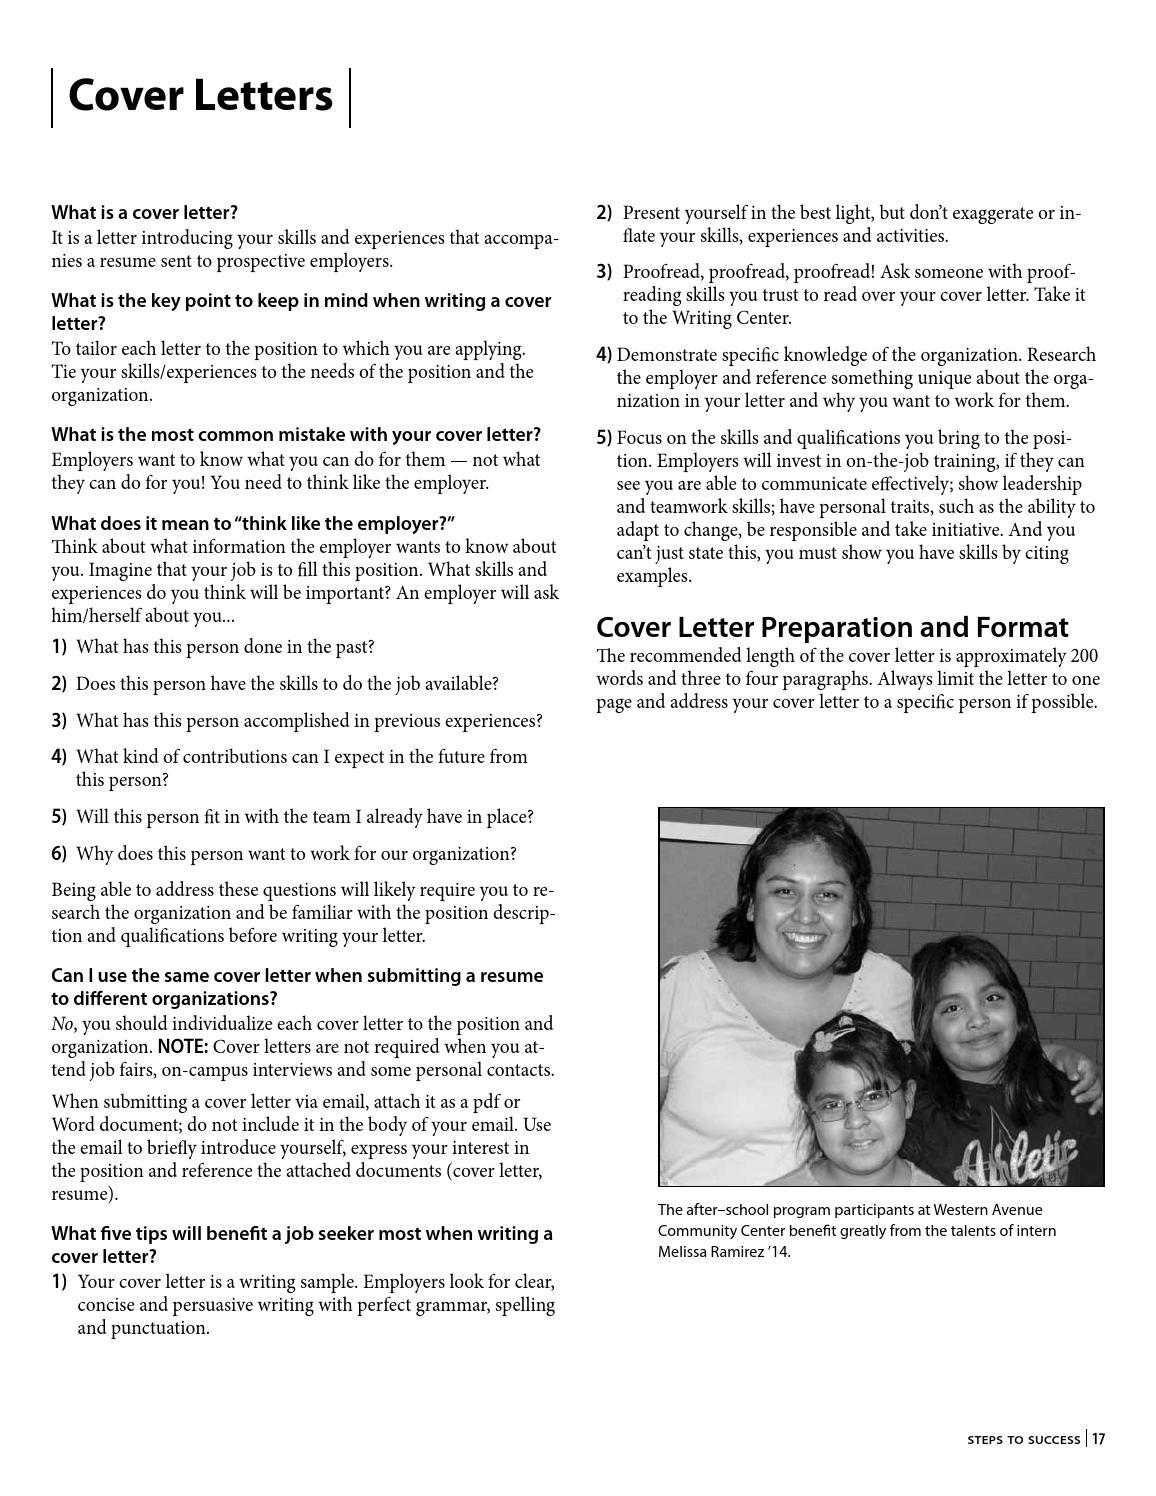 Steps to Success 2013 by Illinois Wesleyan University - issuu